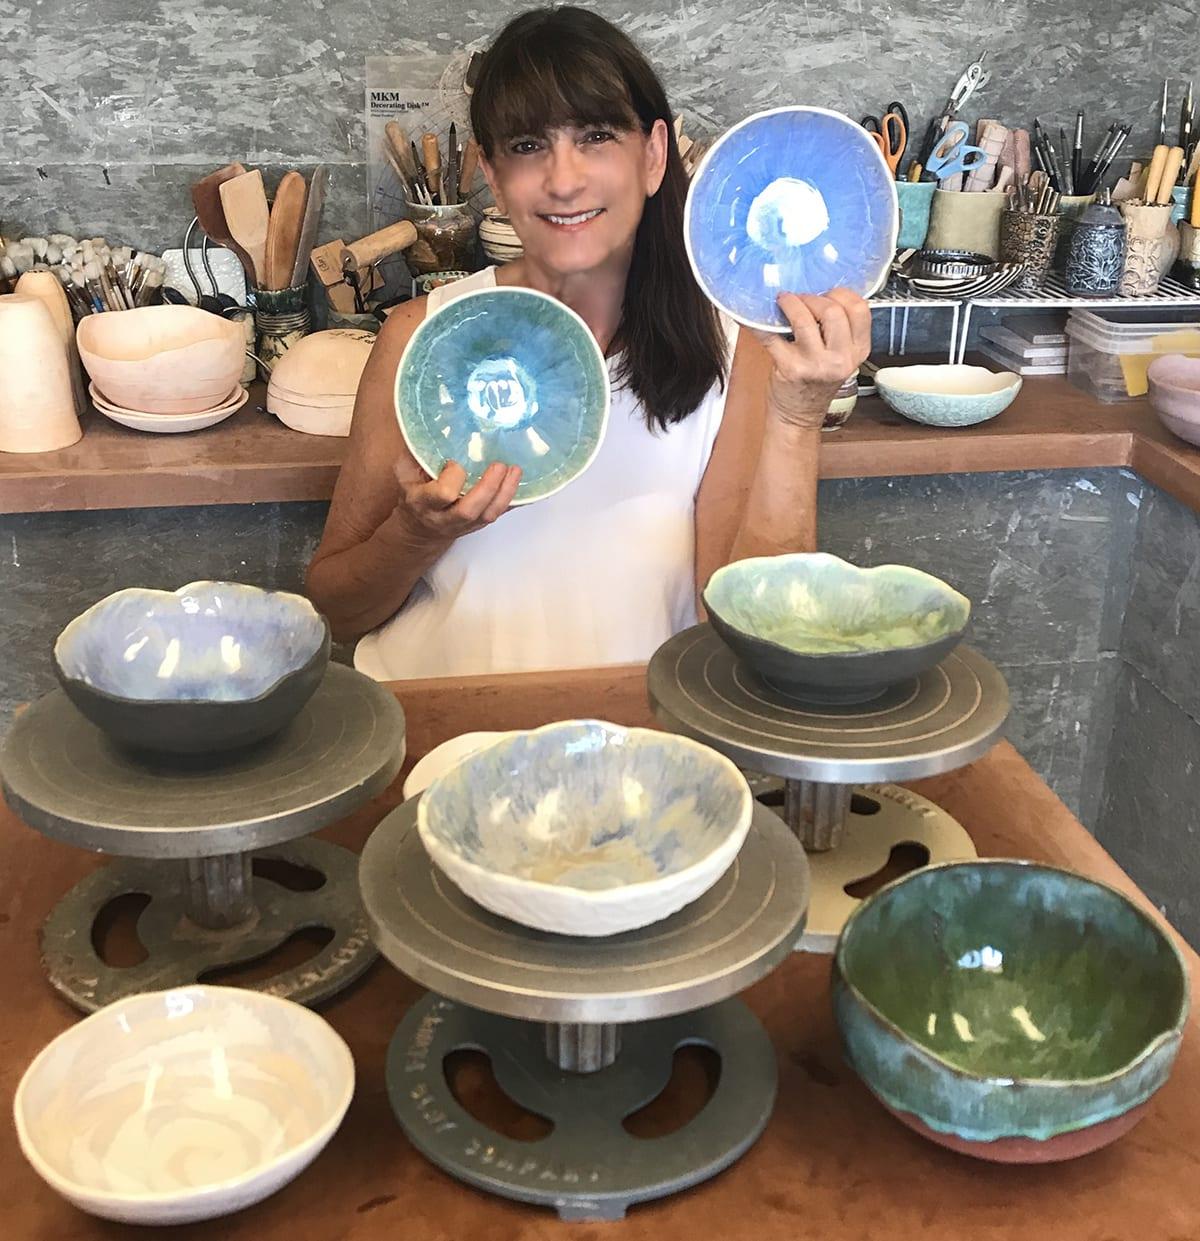 Ellen with Bowls